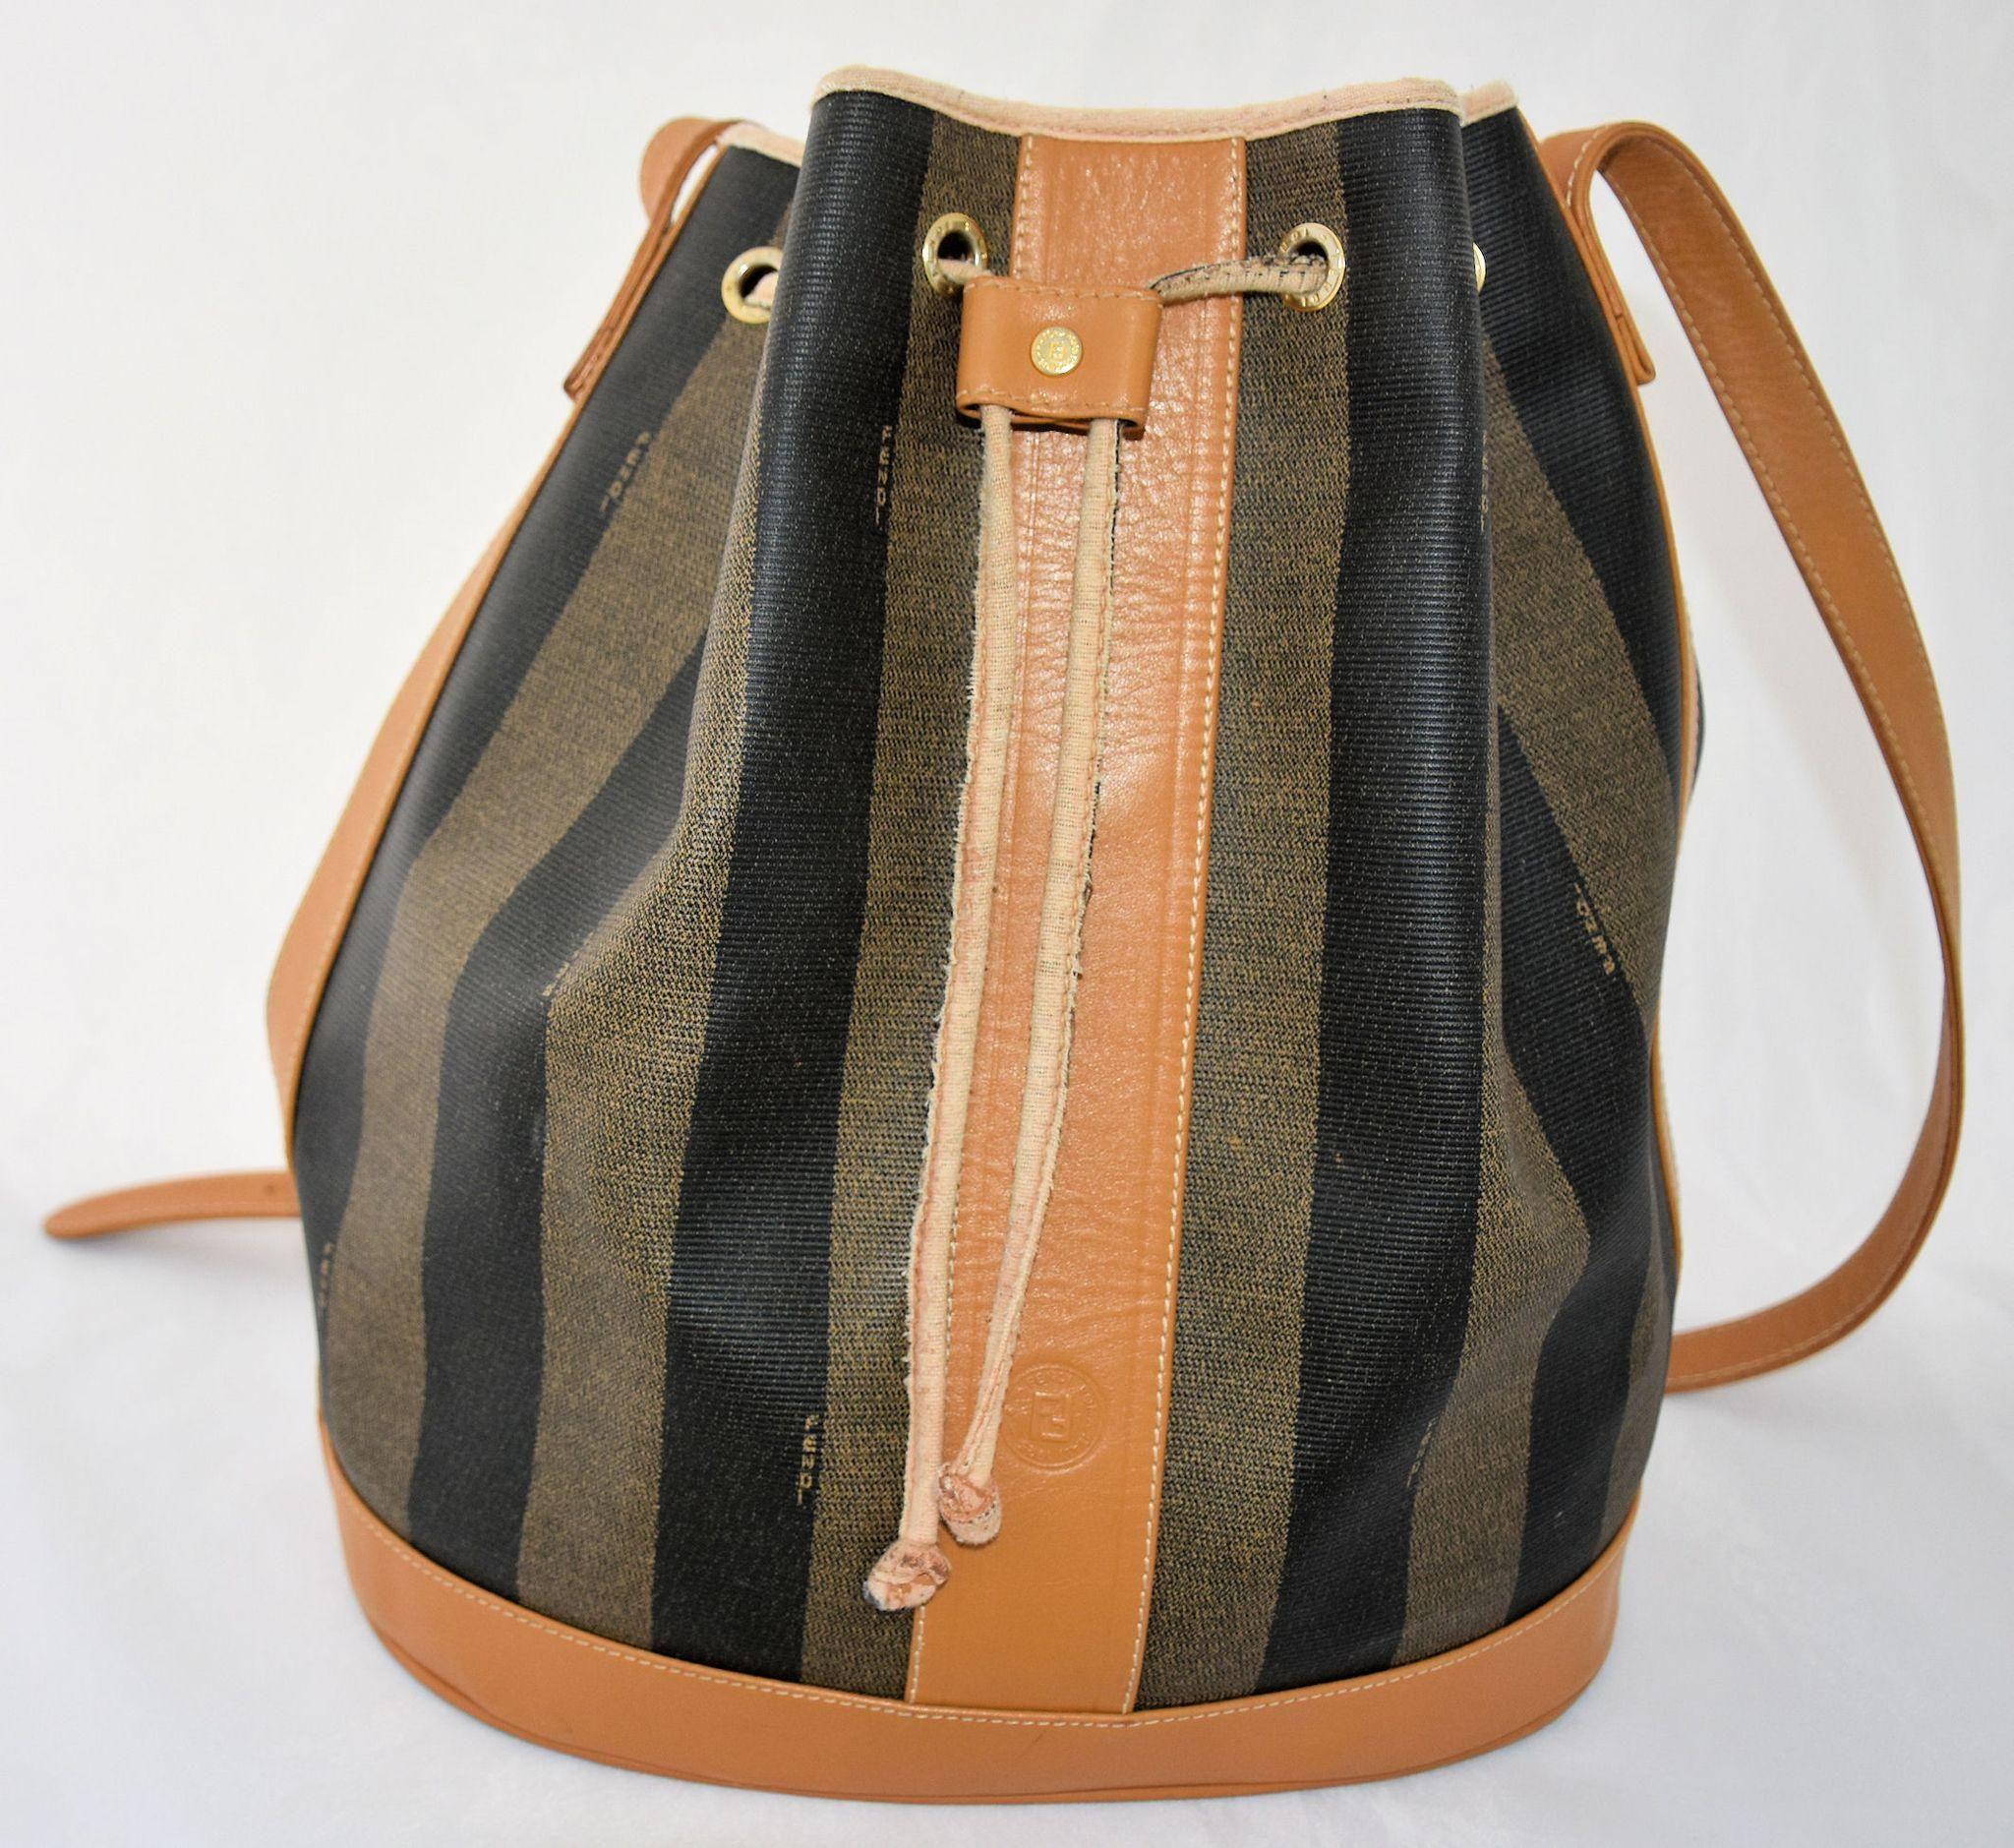 a84fe66db04b Vintage Fendi Shoulder Bucket Bag Classic Stripe Drawstring Purse Large  Tote Handbag Made in Italy from  antikavenue on  rubylane  Fendi   vintagehandbags